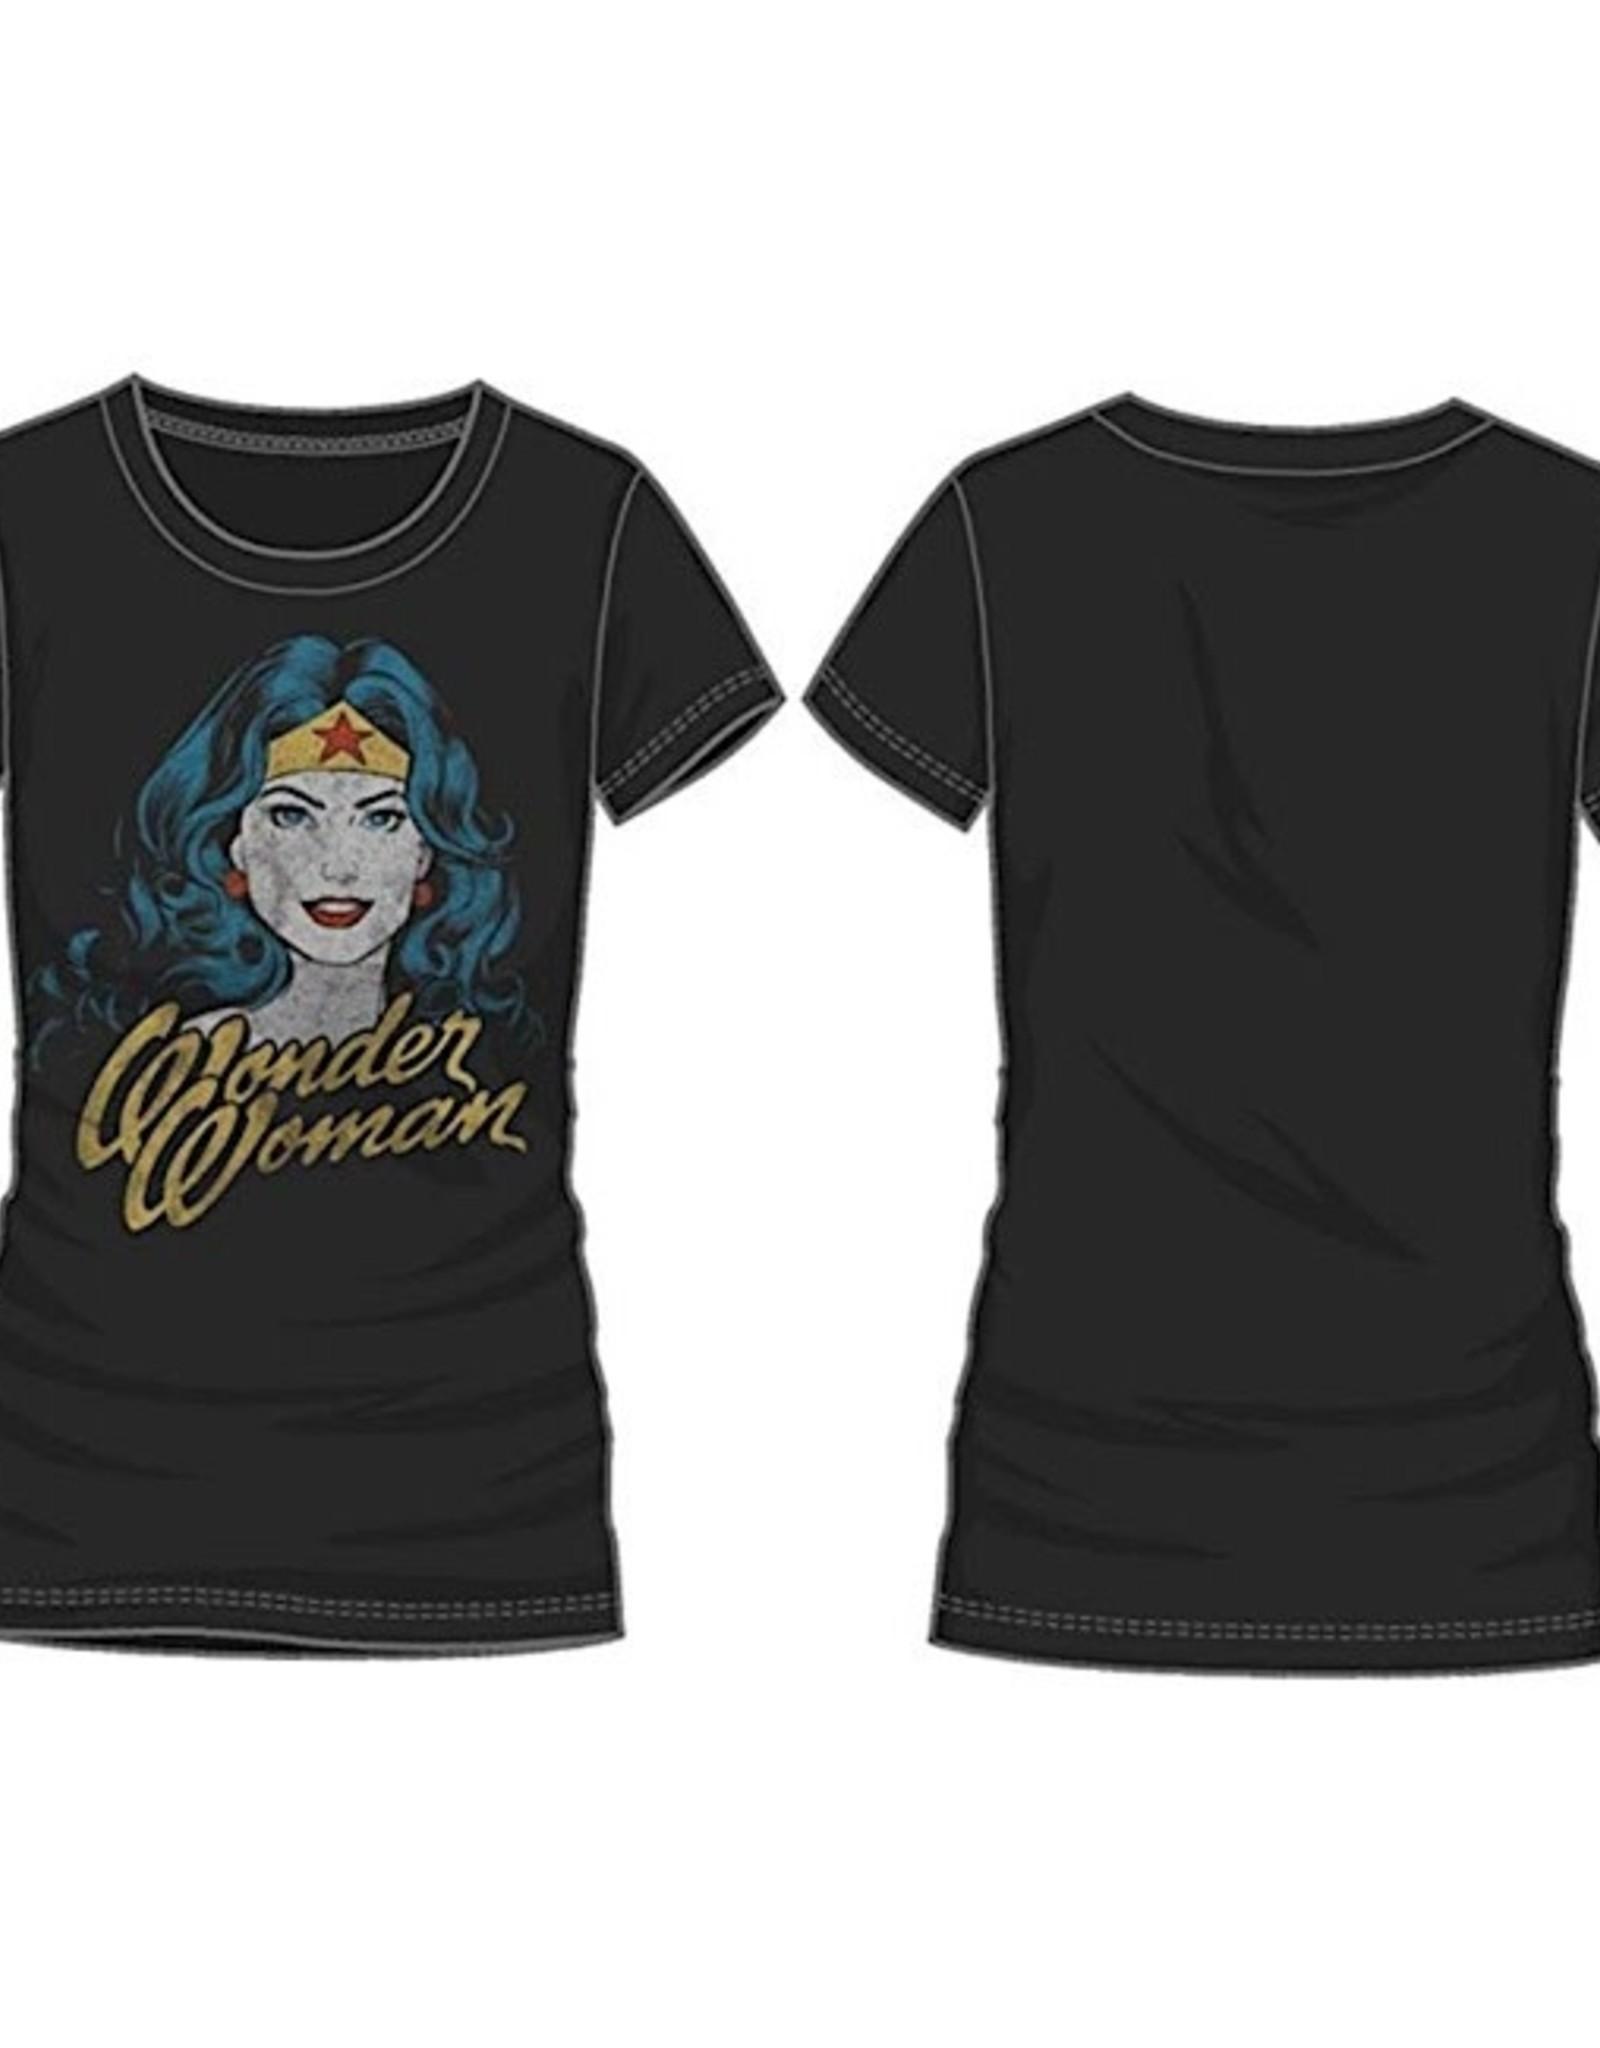 T-Shirt - Wonder Woman